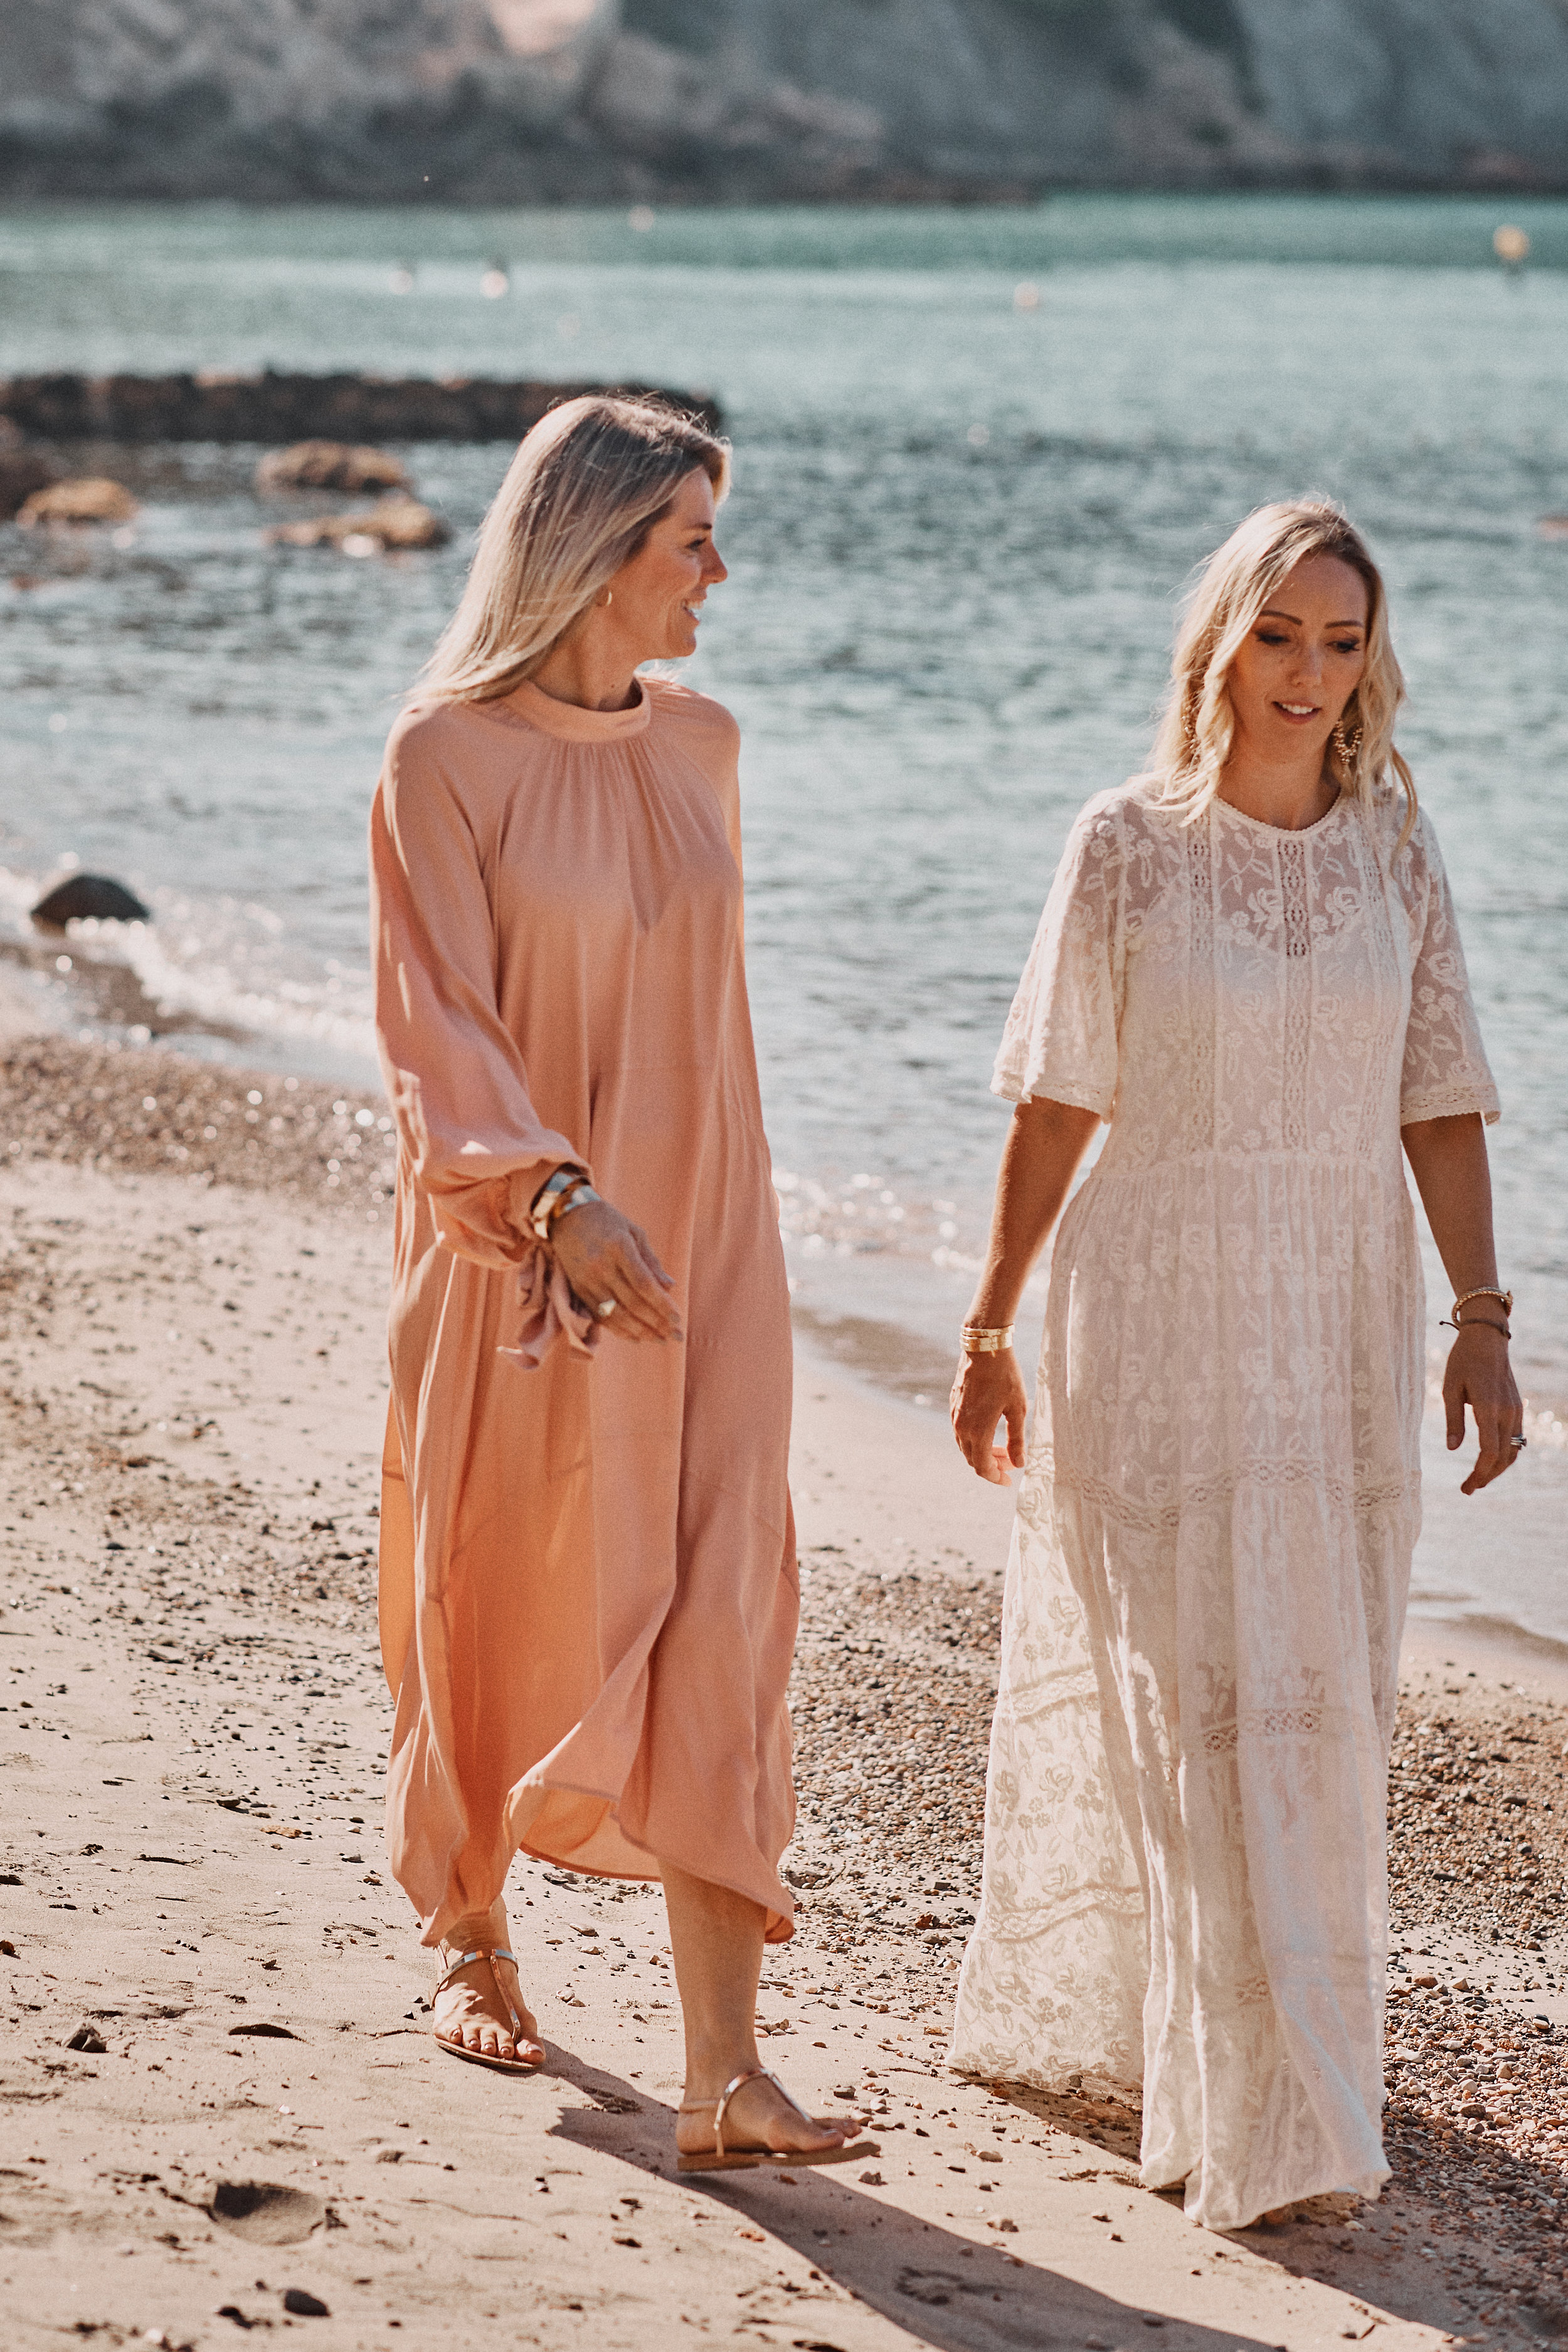 Gemma_Kerry_Ibiza_Wedding0005.jpg